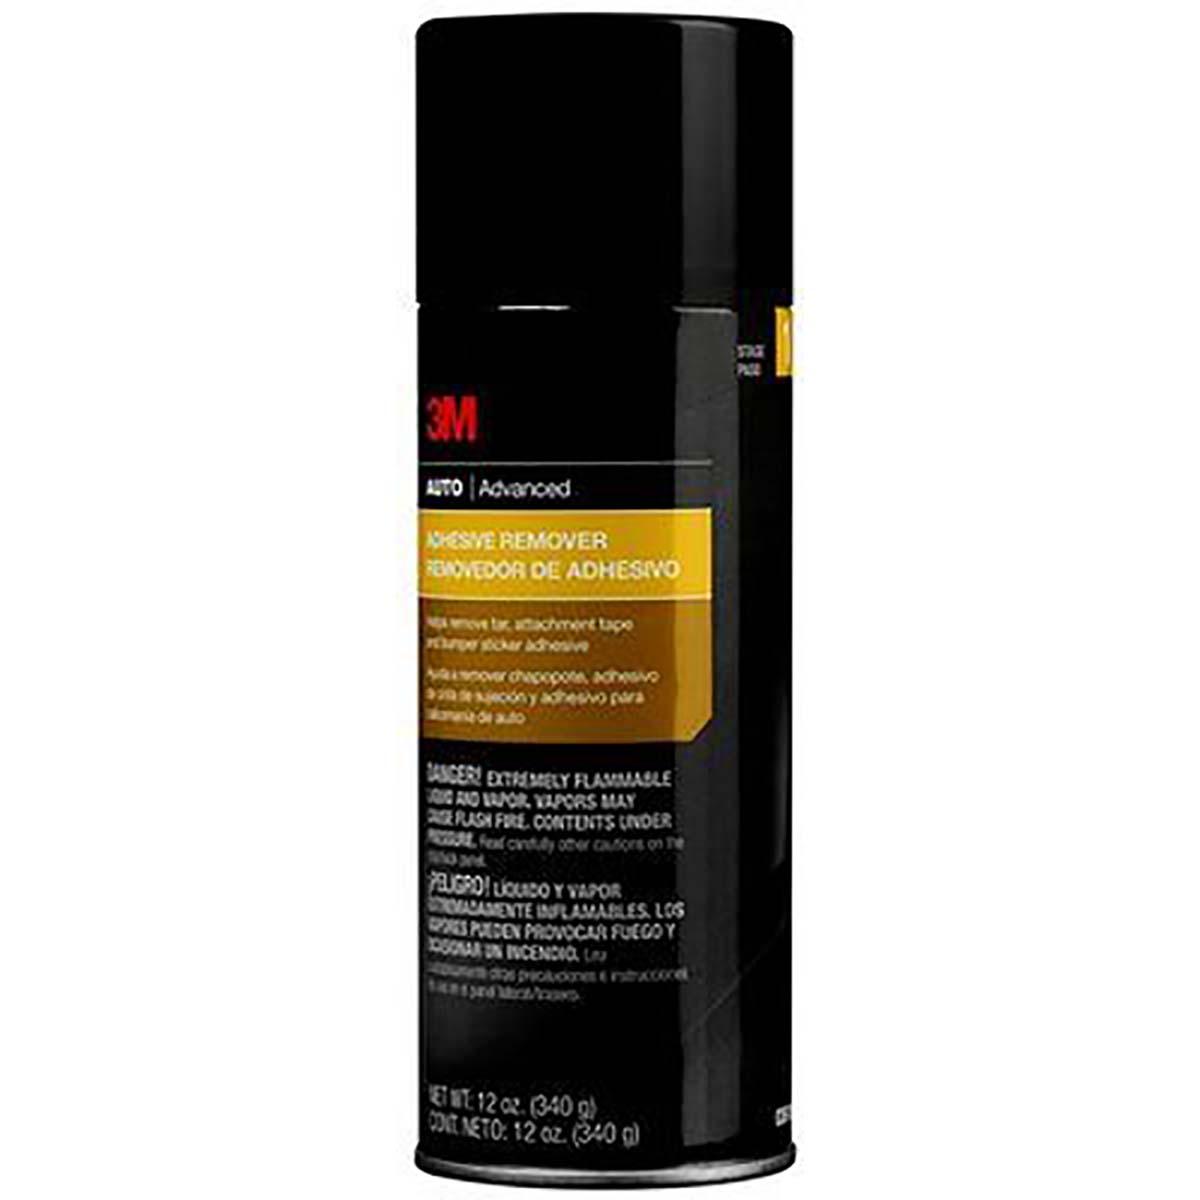 3M Adhesive Remover, 03618, 12 oz